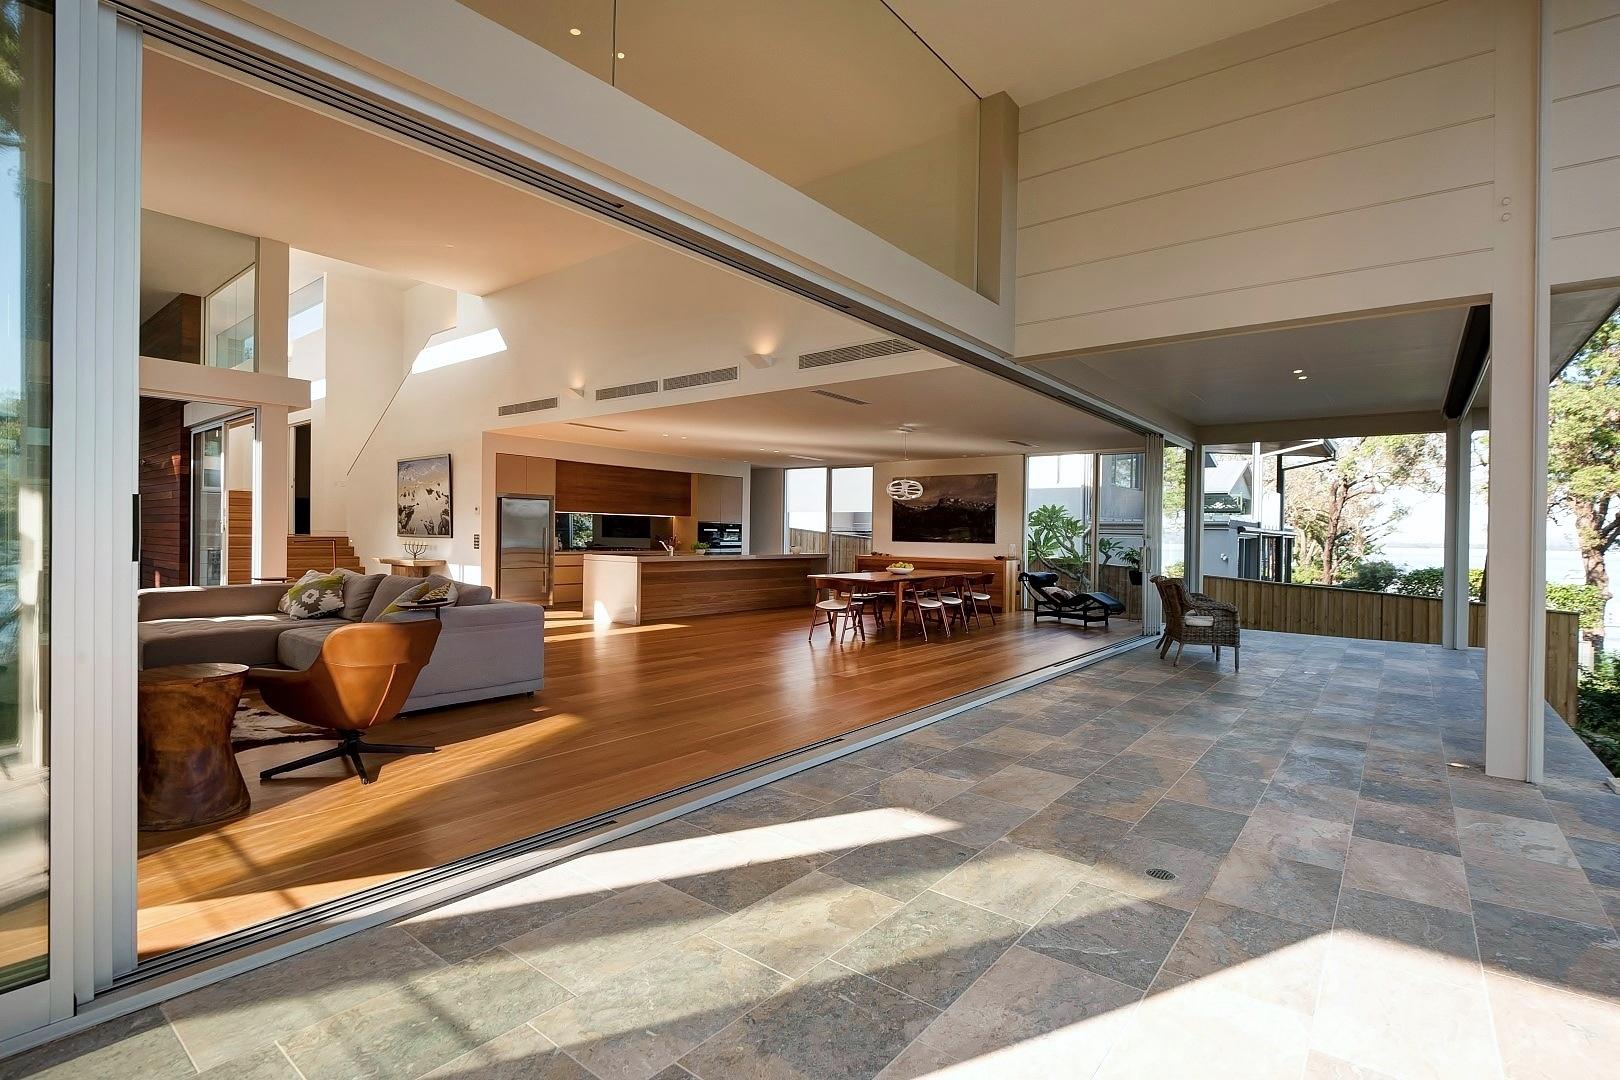 Waterfront Property interior design